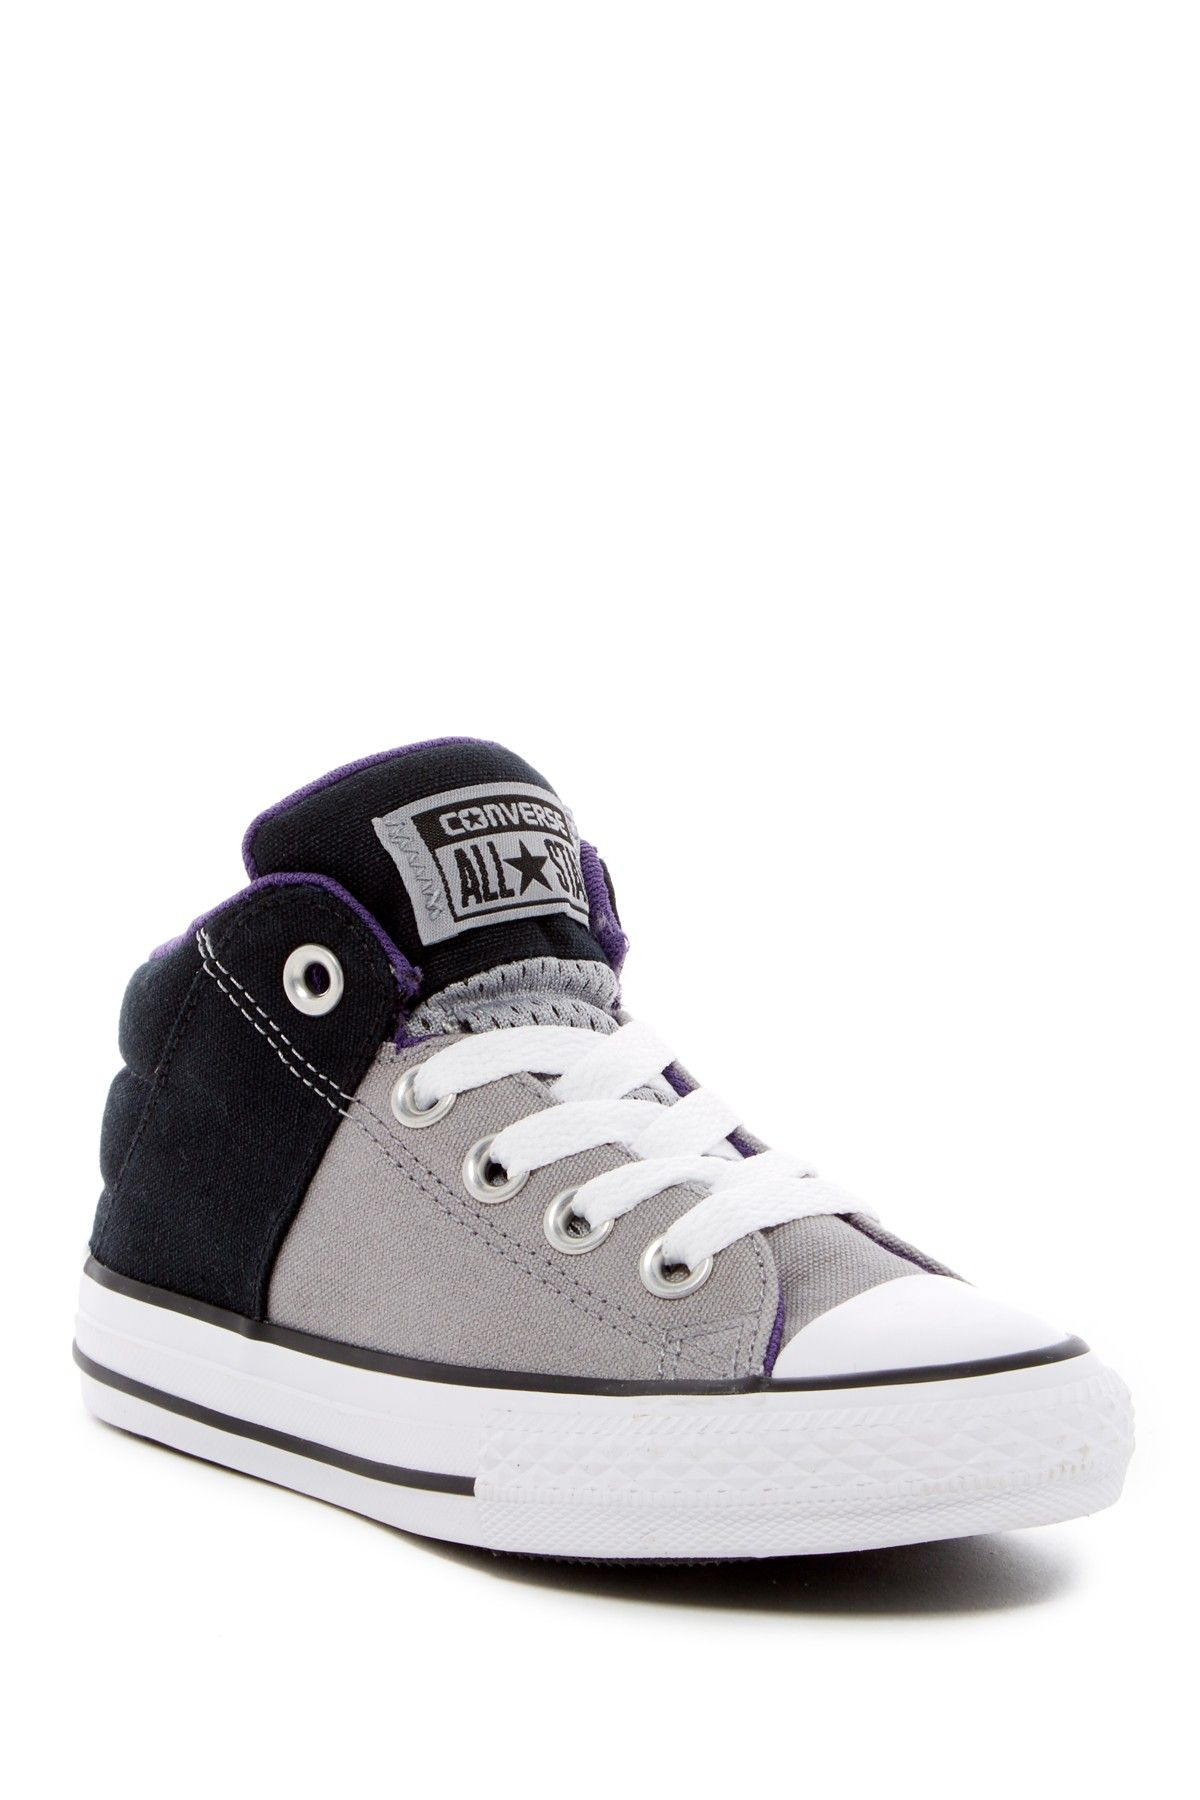 Converse Chuck Taylor All Star Lo Sneaker Little Kid White